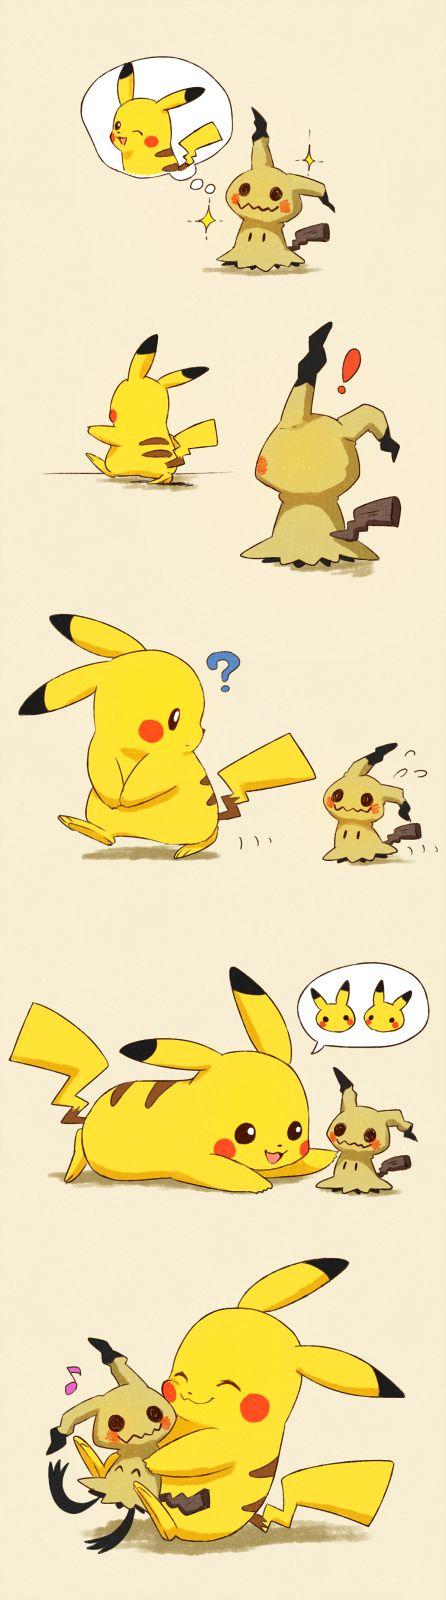 Pikachu and Mimikyu                                                                                                                                                                                 More